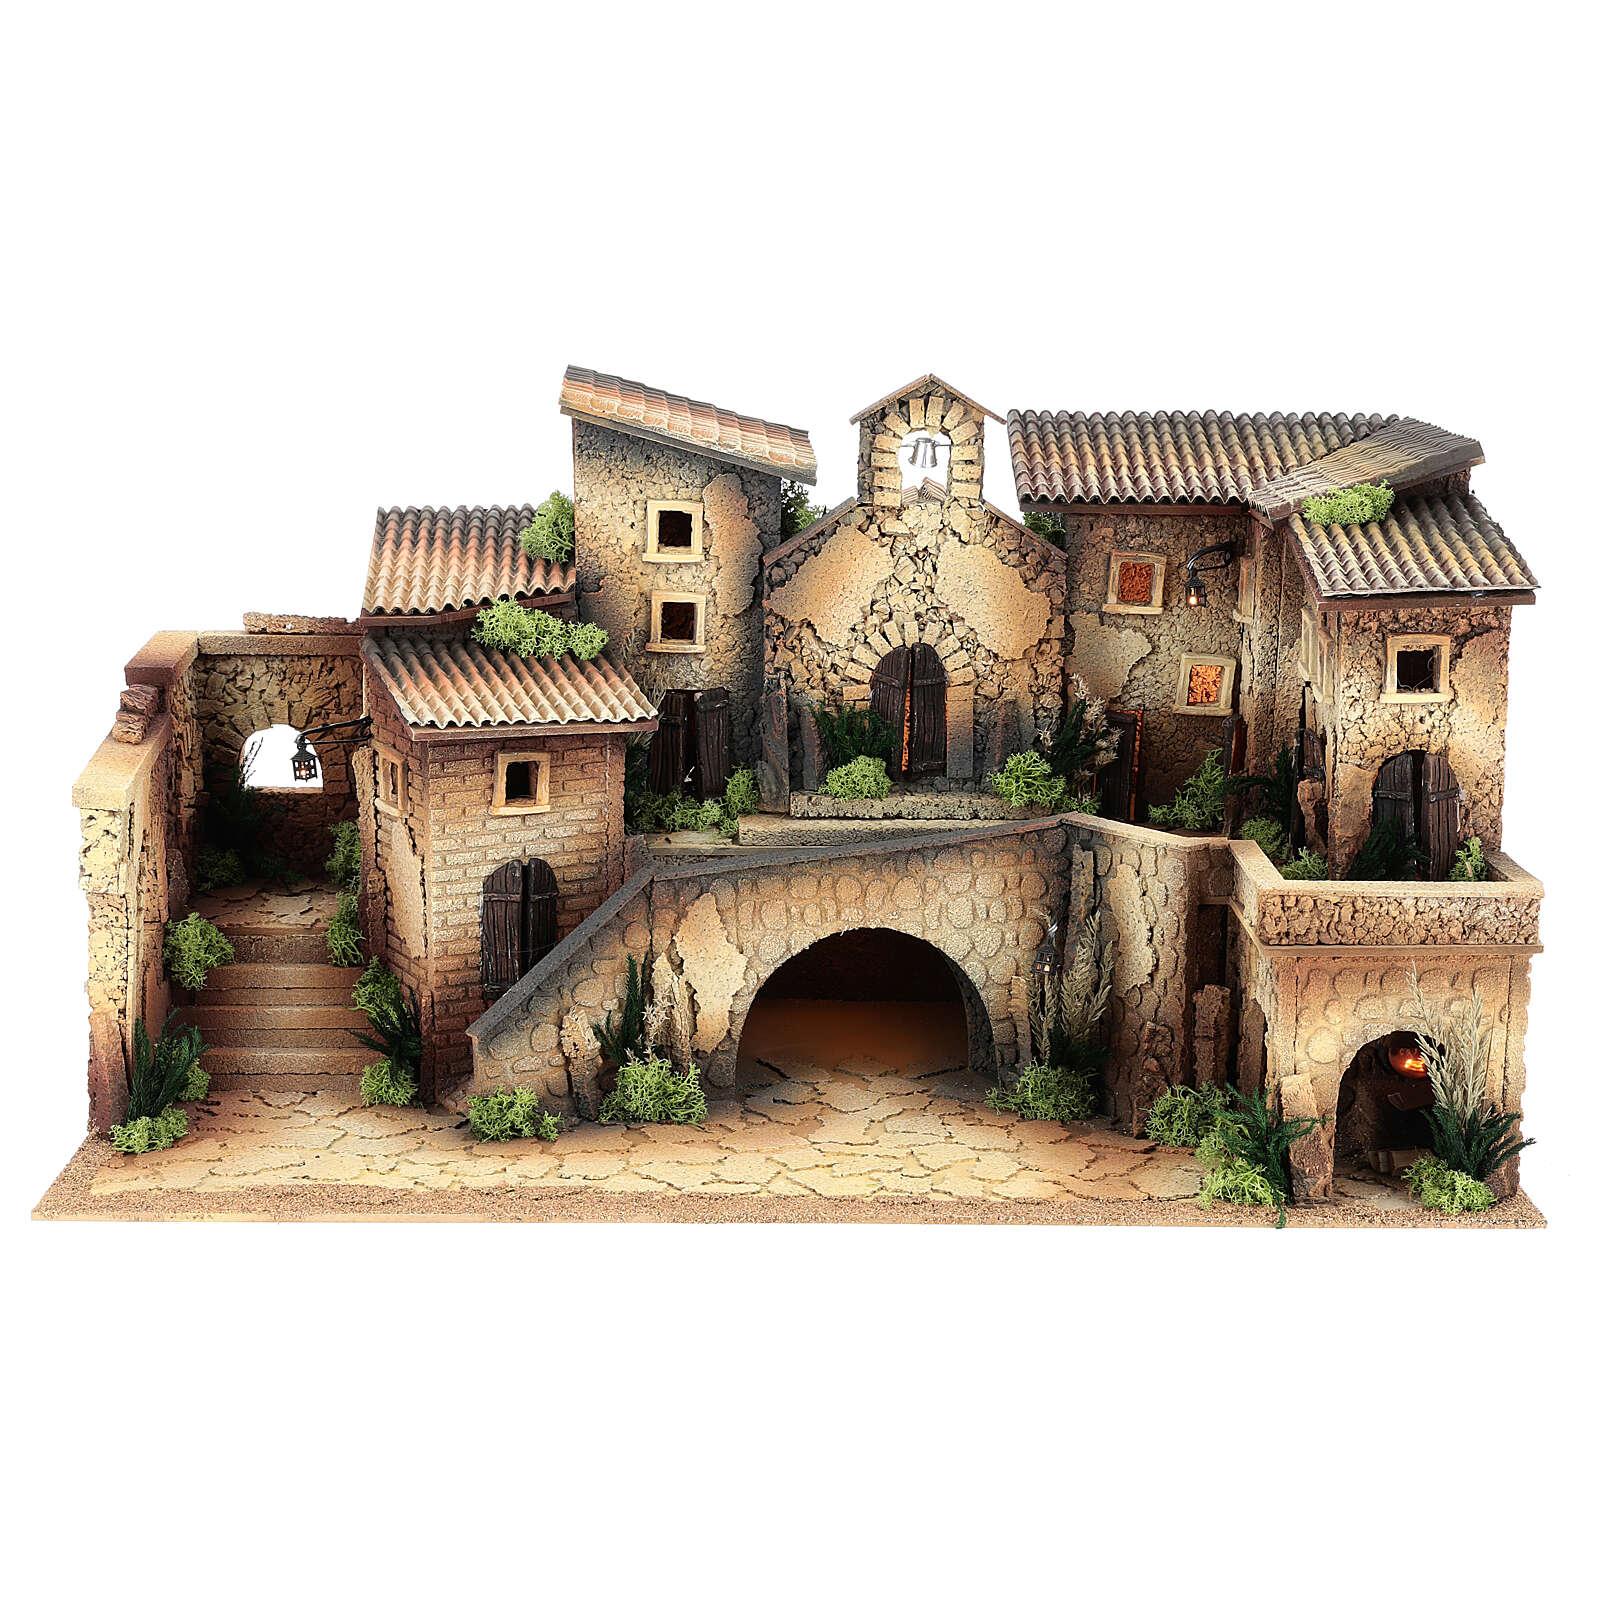 Miniature church with village, 8 cm nativity 40x70x40 cm 4